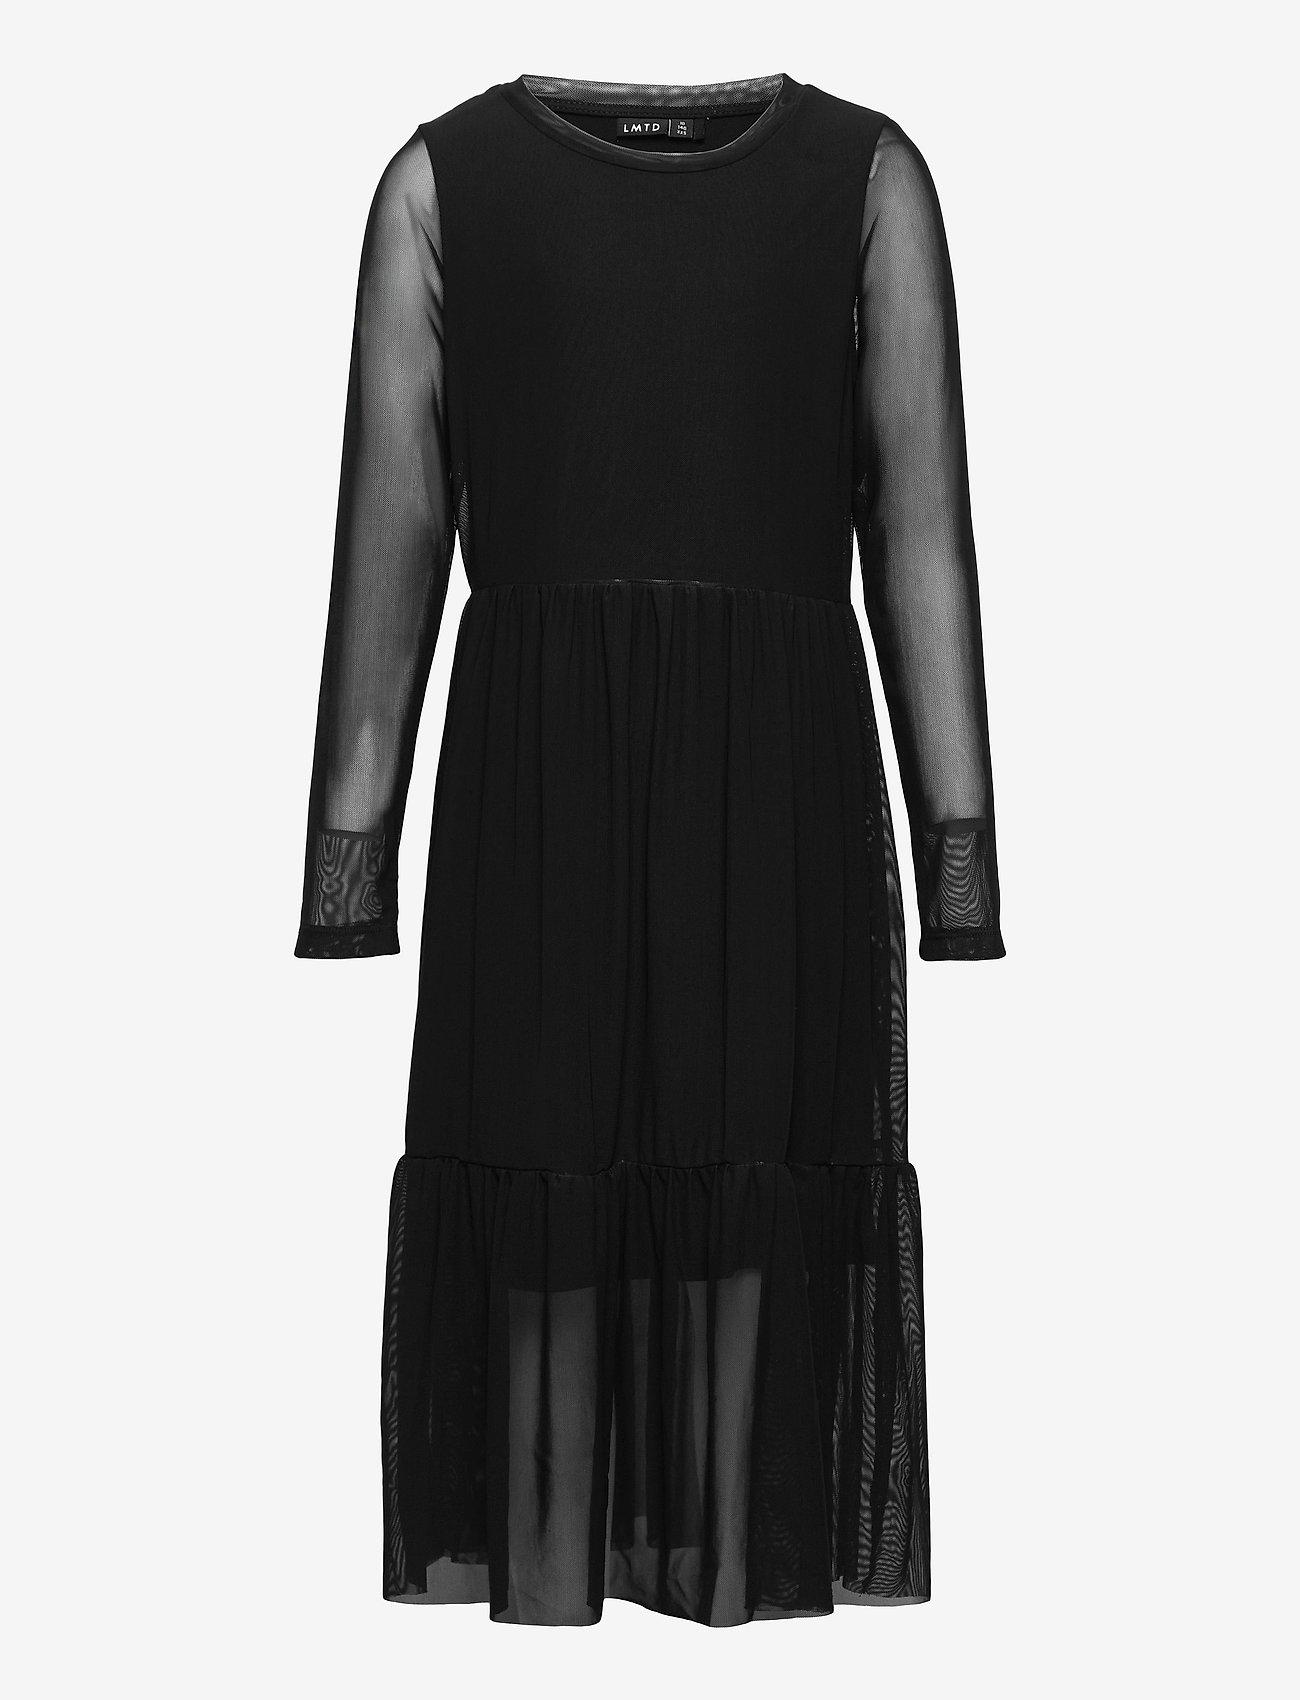 LMTD - NLFRESH LS DRESS - kleider - black - 0